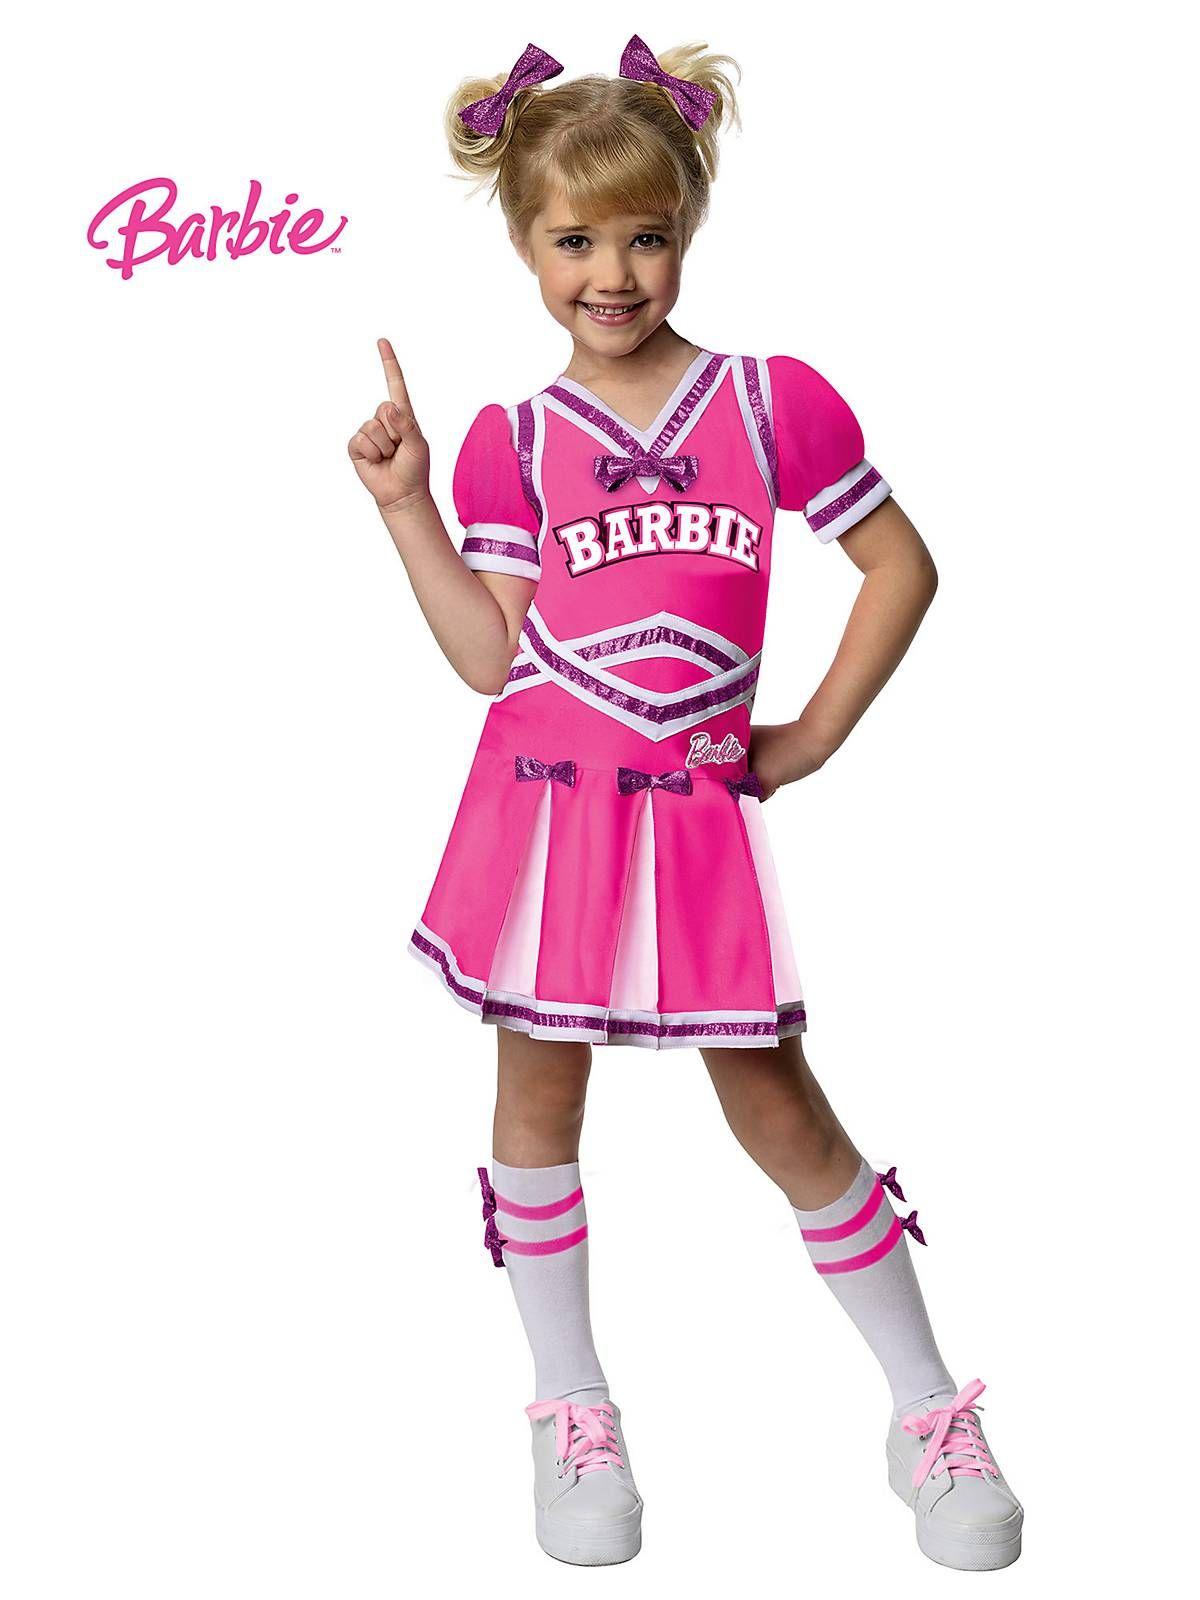 Barbie Cheerleader Costume | Wholesale Barbie Costumes for Girls ...